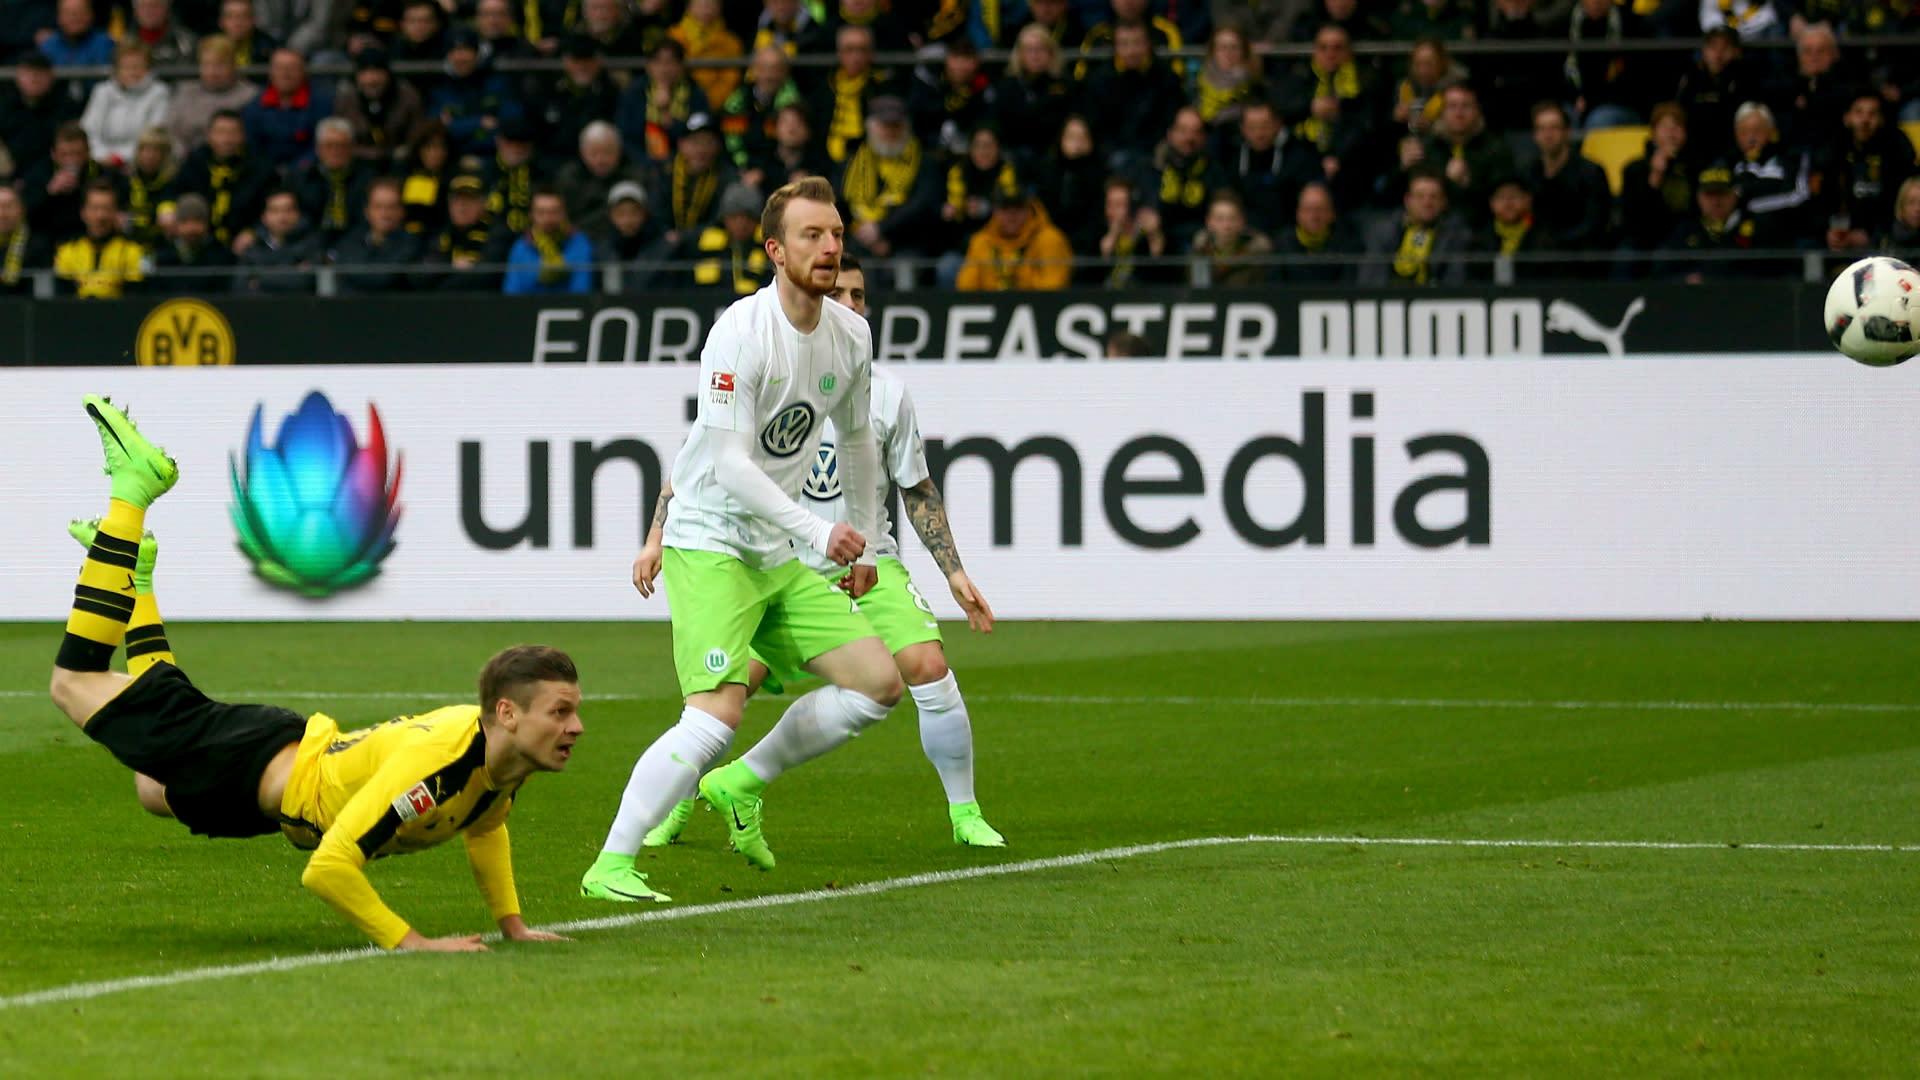 Borussia Dortmund 3 Wolfsburg 0 Piszczek Stars With Yellow Wall Absent